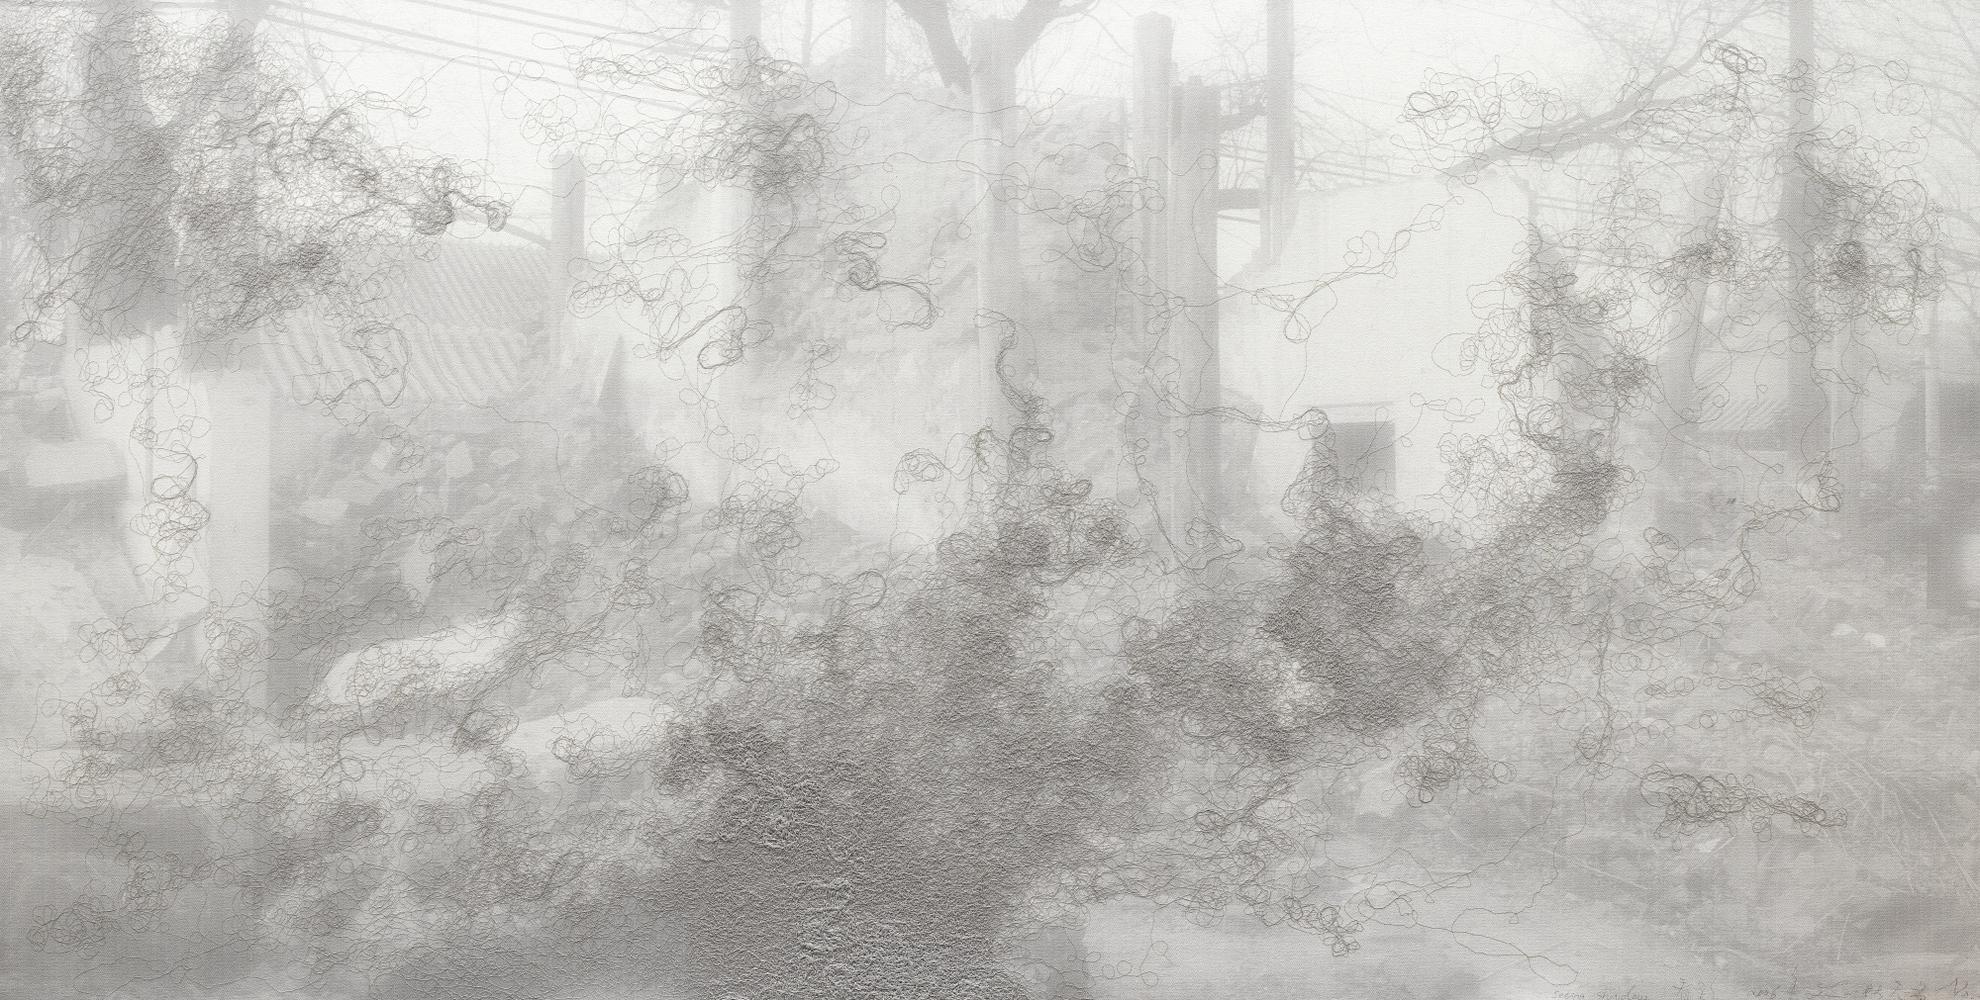 Lin Tianmiao-Seeing Shadow No. 11-2006